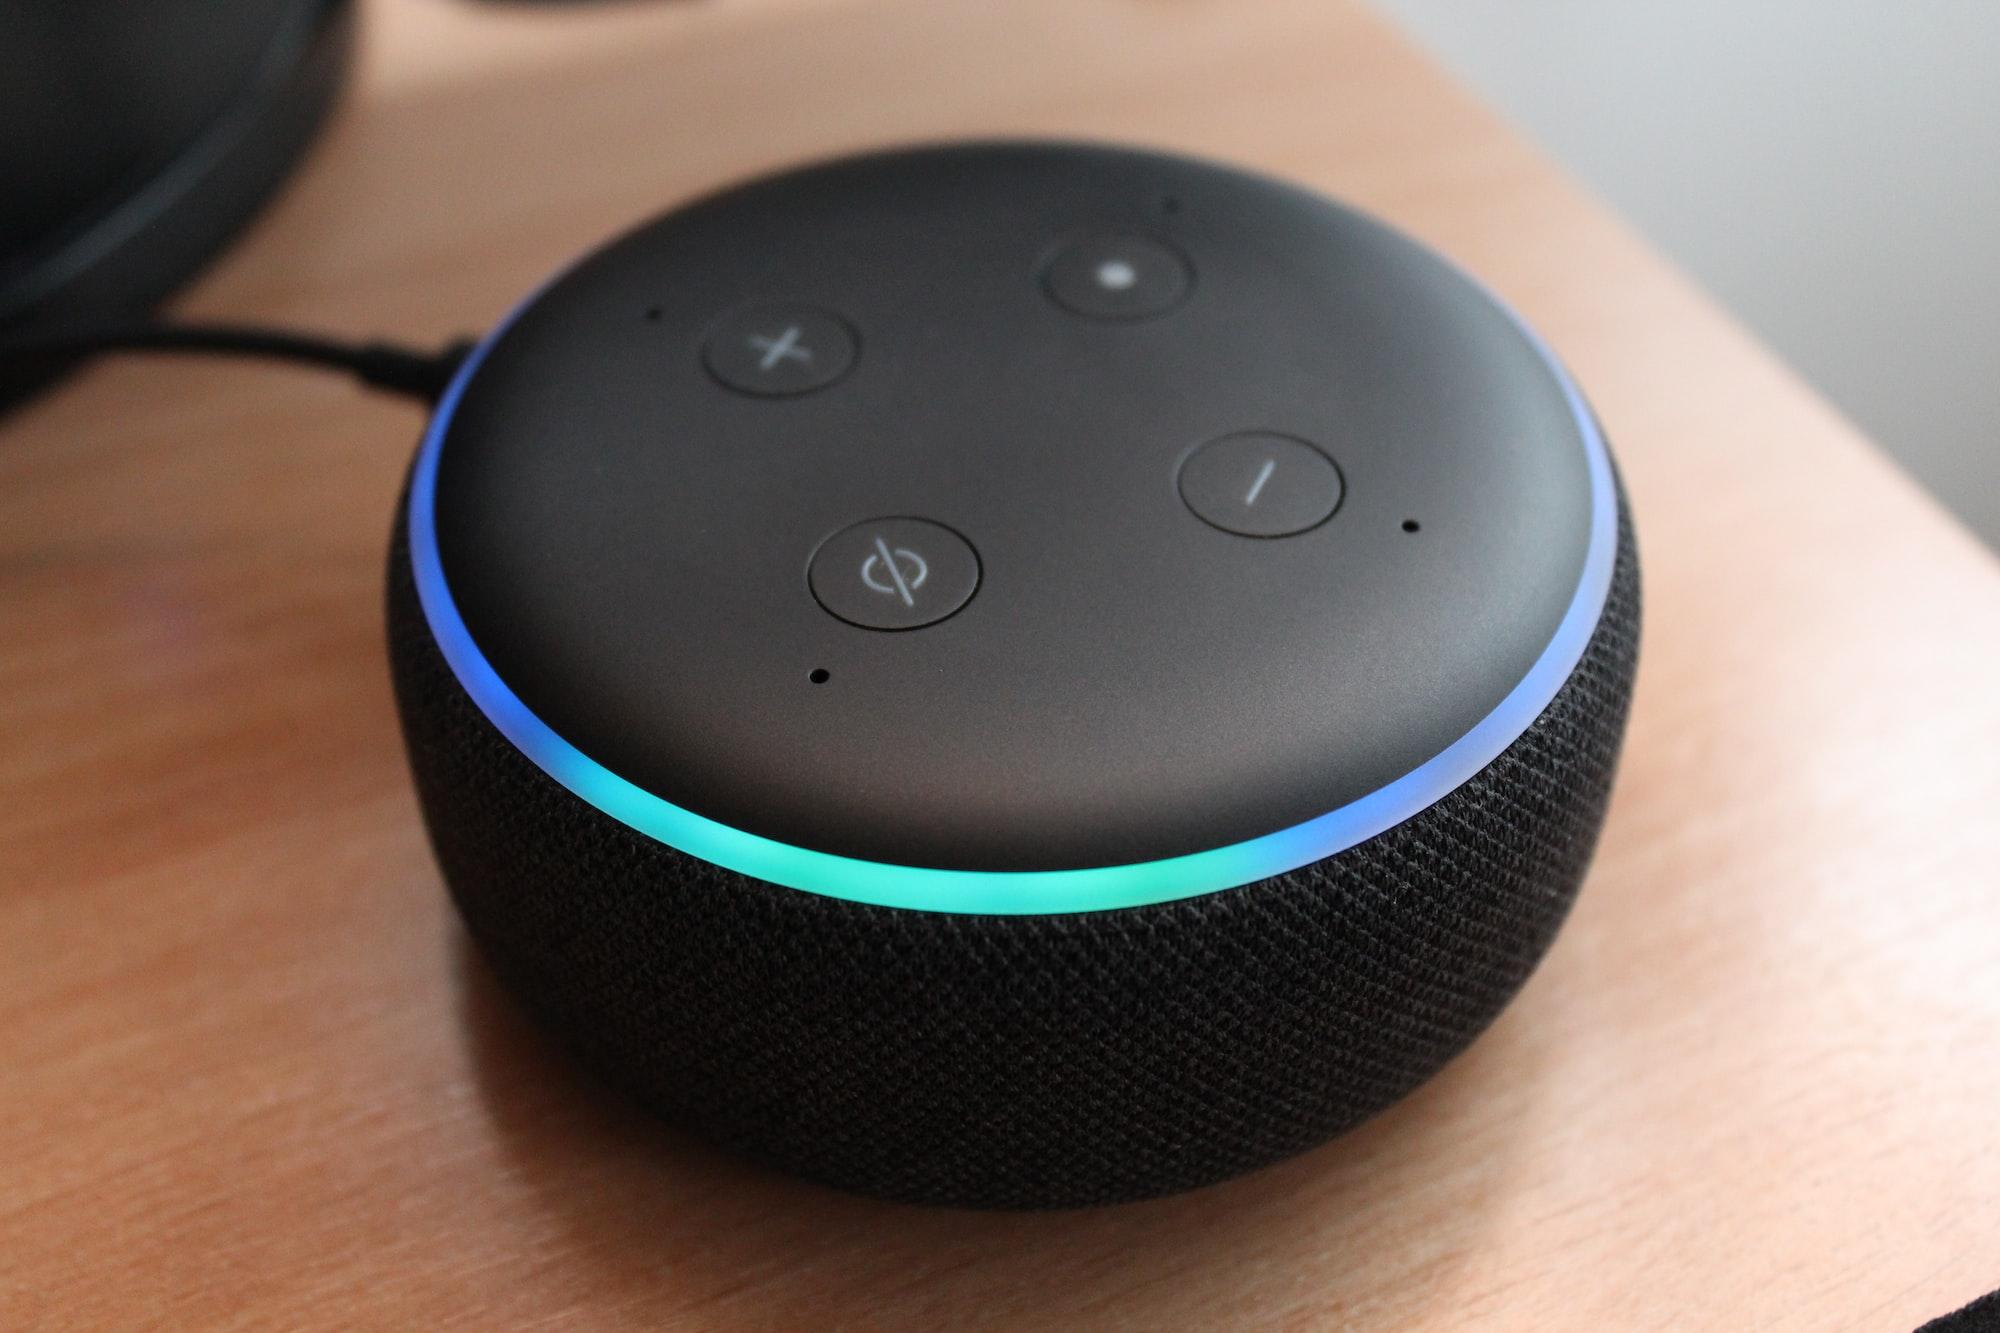 Coding an Amazon Alexa Skill in Java Using Dialog Directives